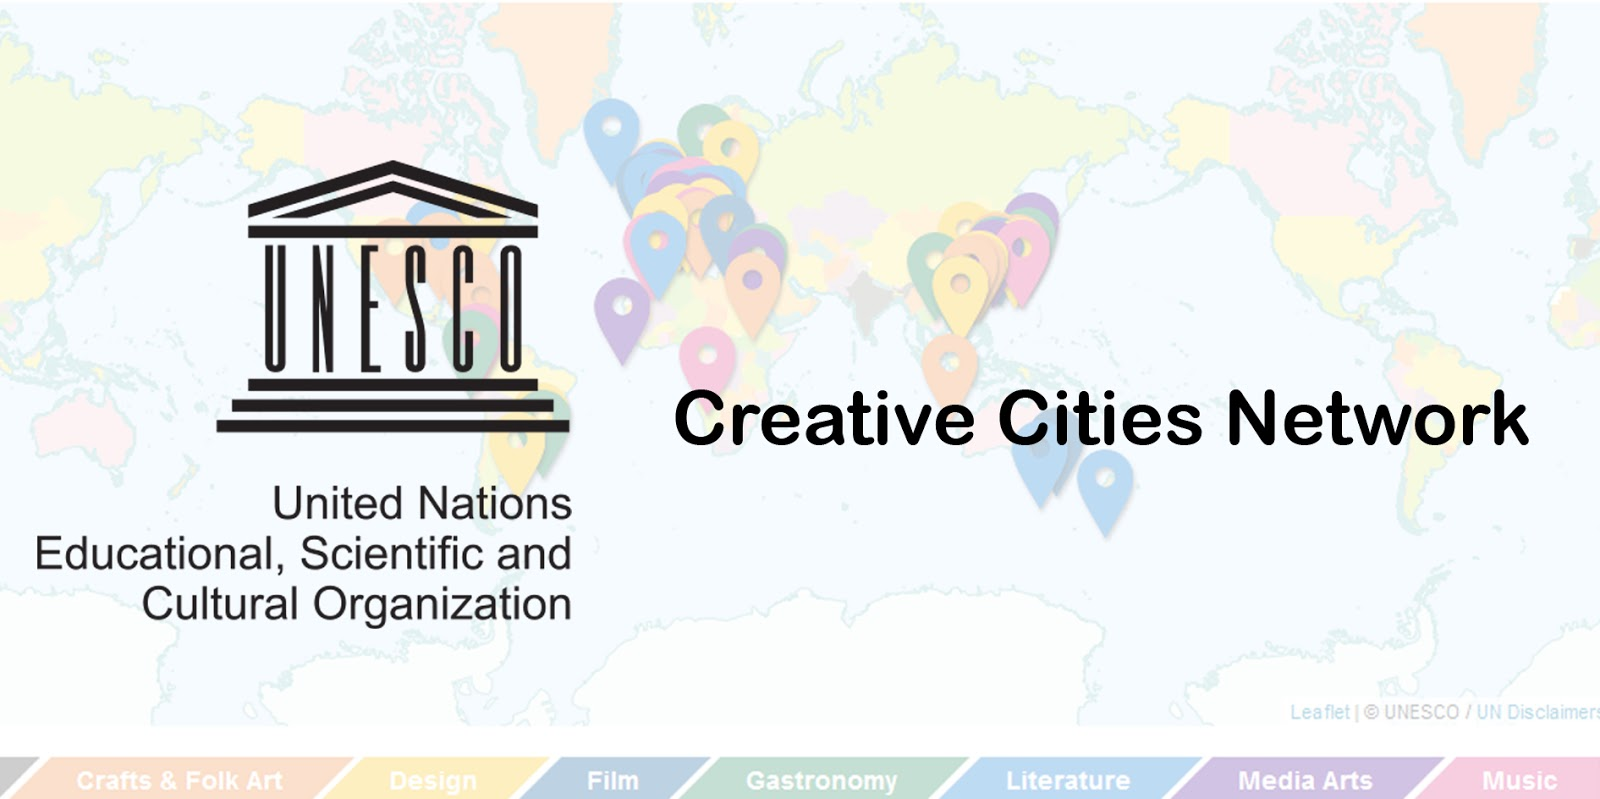 Bandung Terpilih Menjadi Jaringan Kota Kreatif Bidang Desain oleh UNESCO